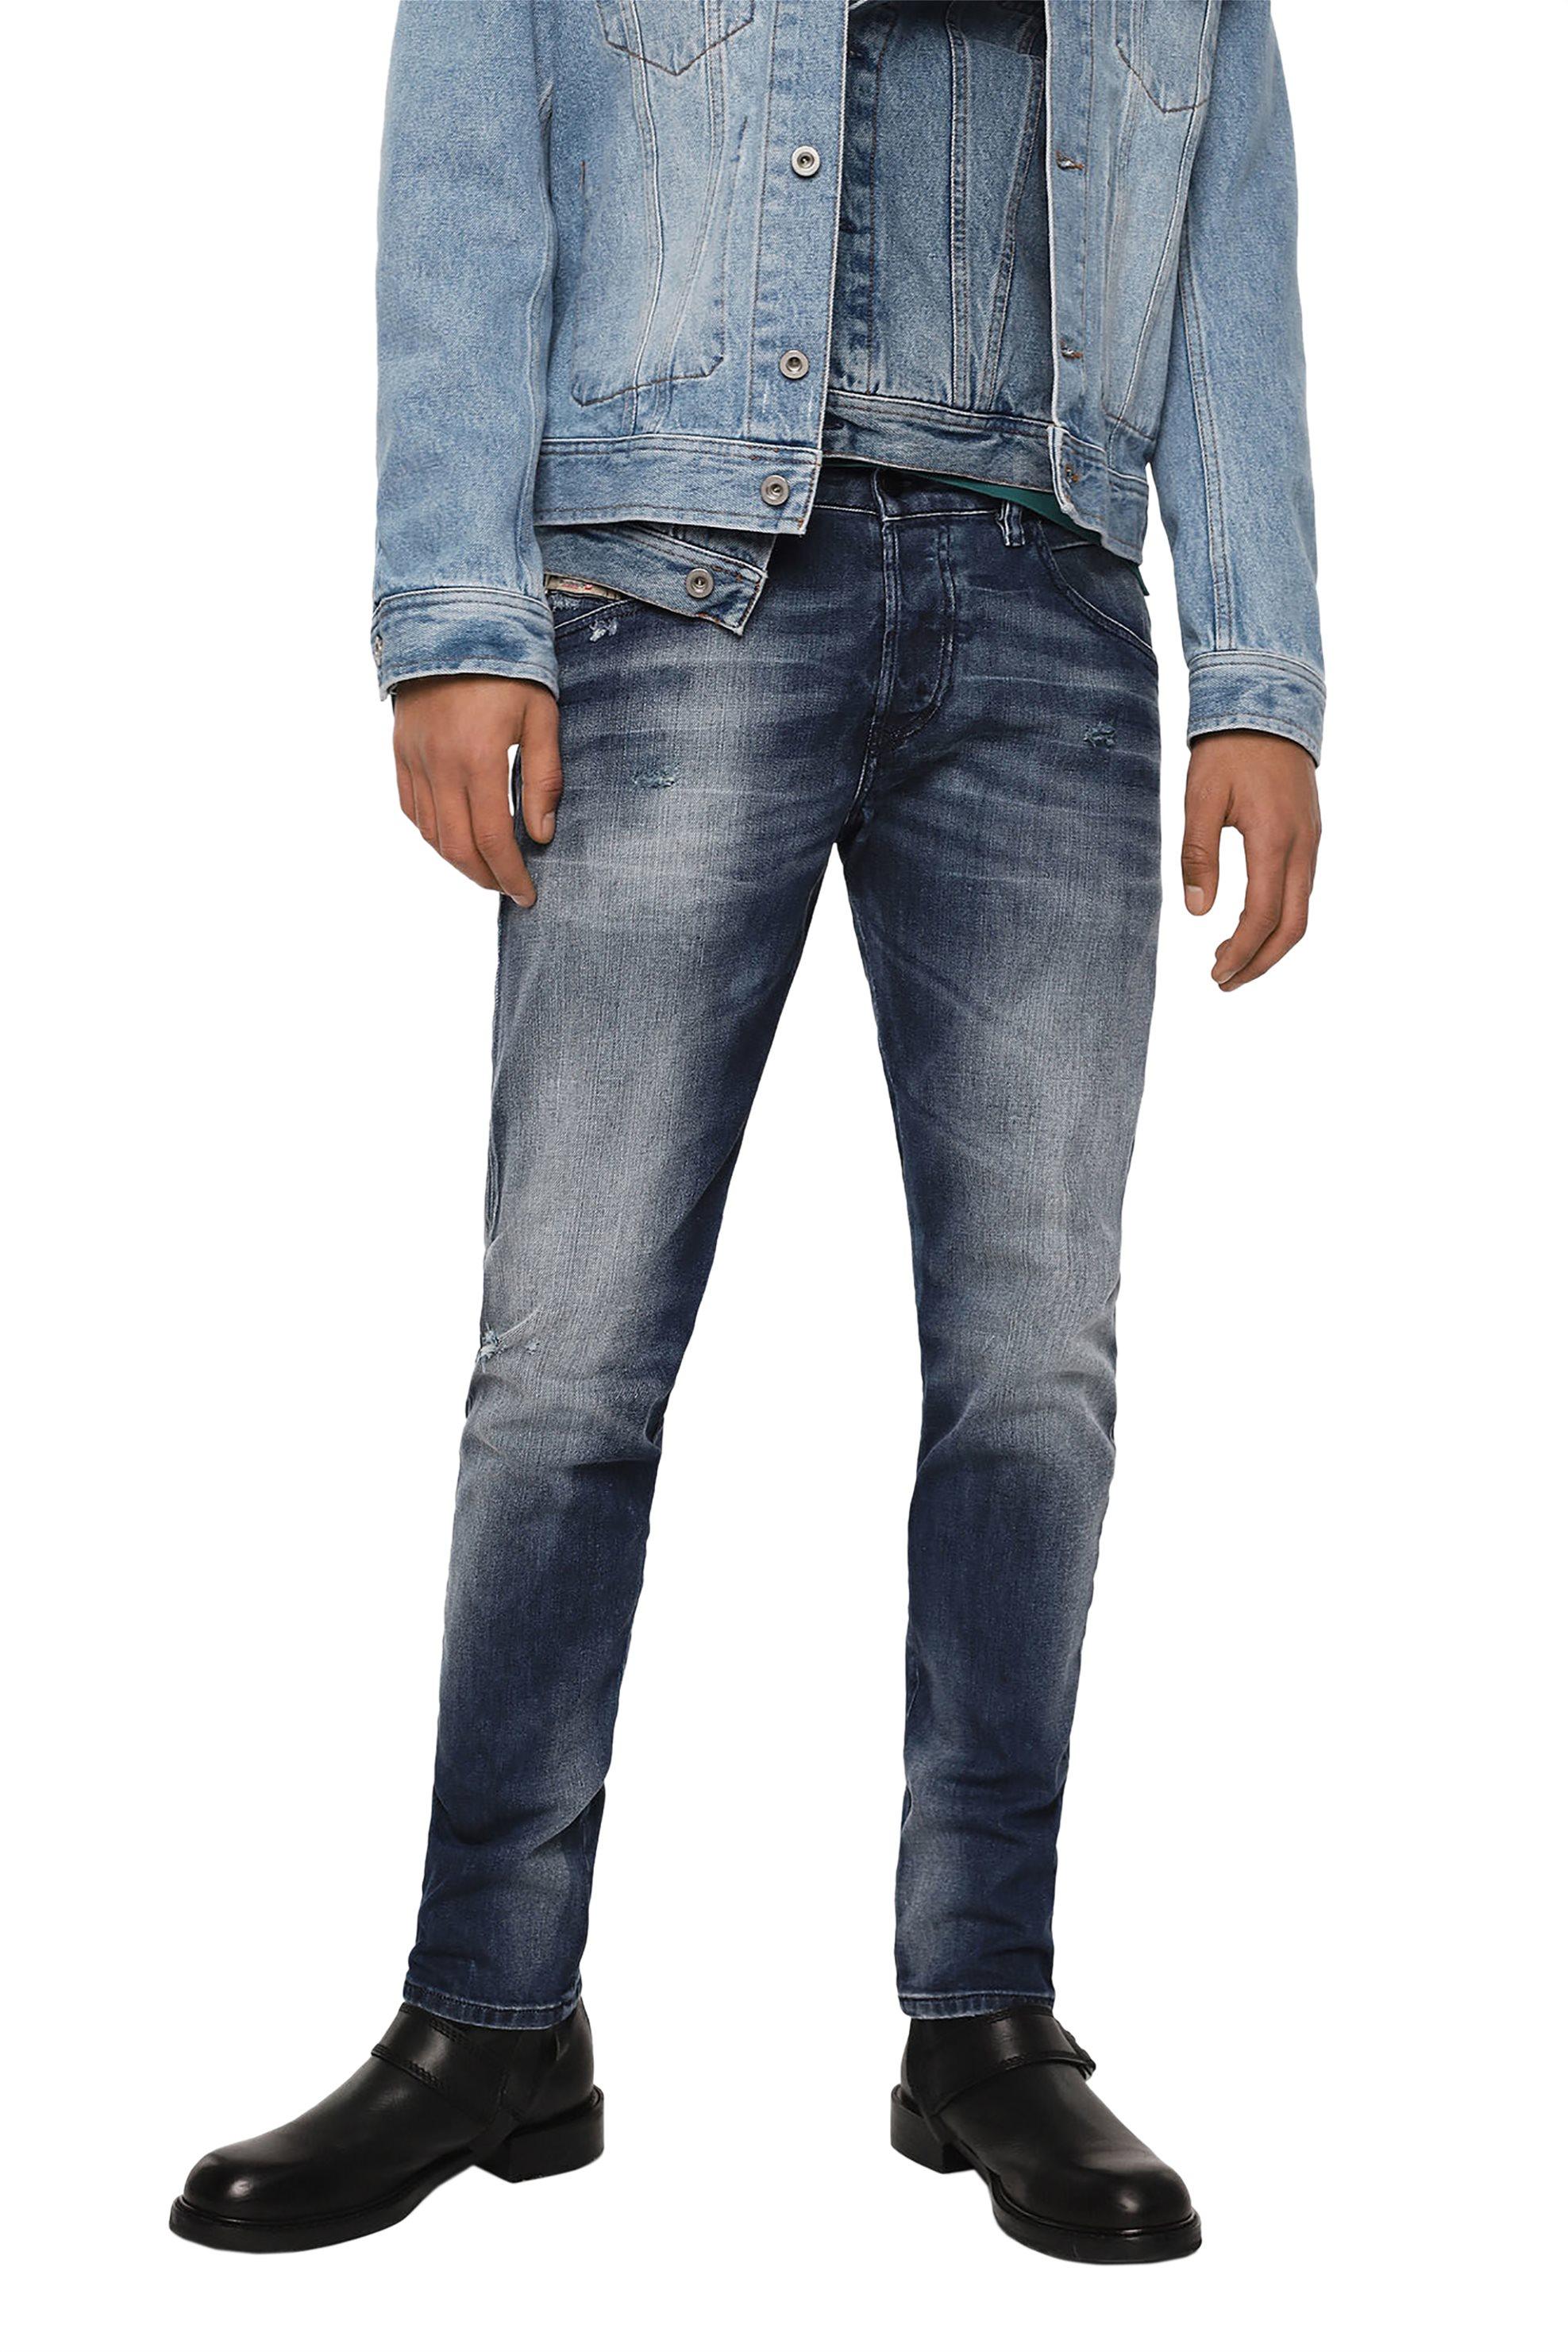 Diesel ανδρικό τζην παντελόνι Bazer (32L) - 00SSLL 084DD - Μπλε ανδρασ   ρουχα   jeans   tapered